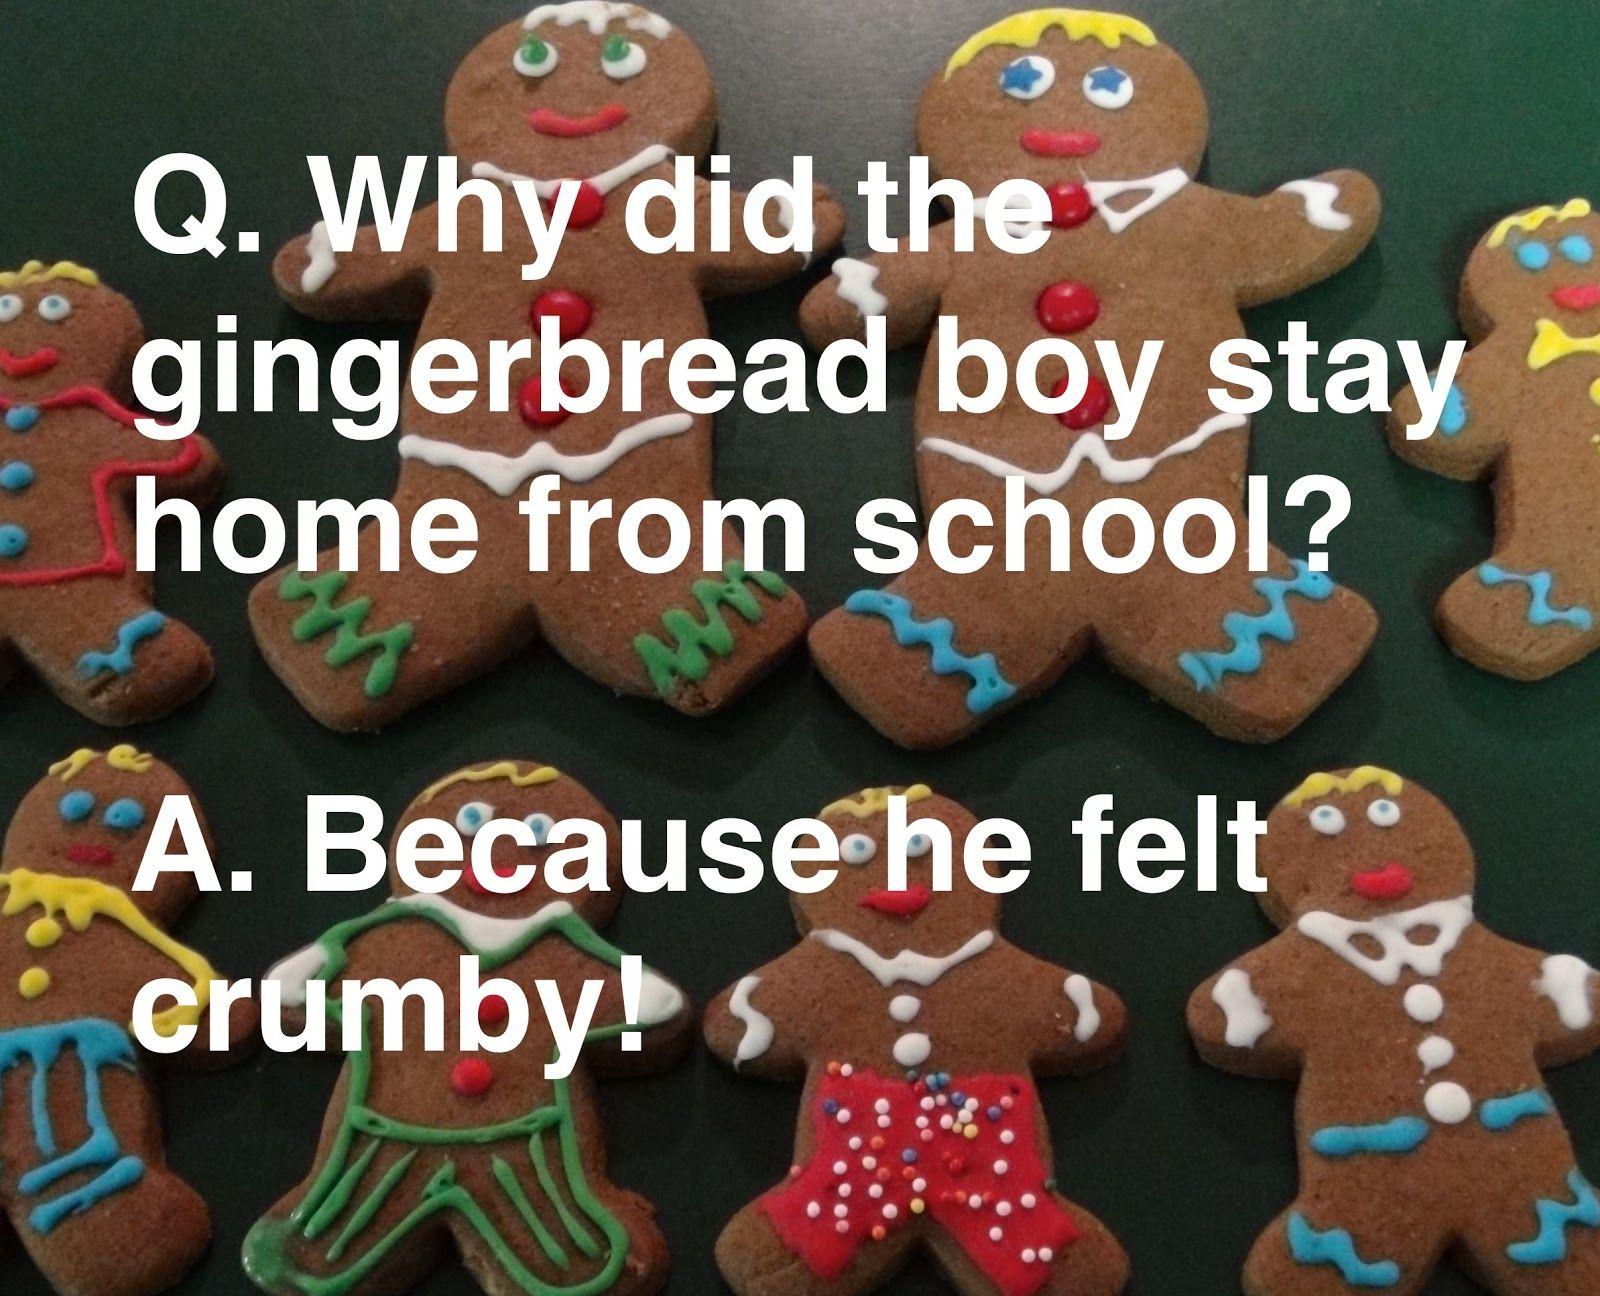 An Old Fashioned Christmas Christmas Jokes For Kids Kid Friendly Jokes Funny Jokes For Kids